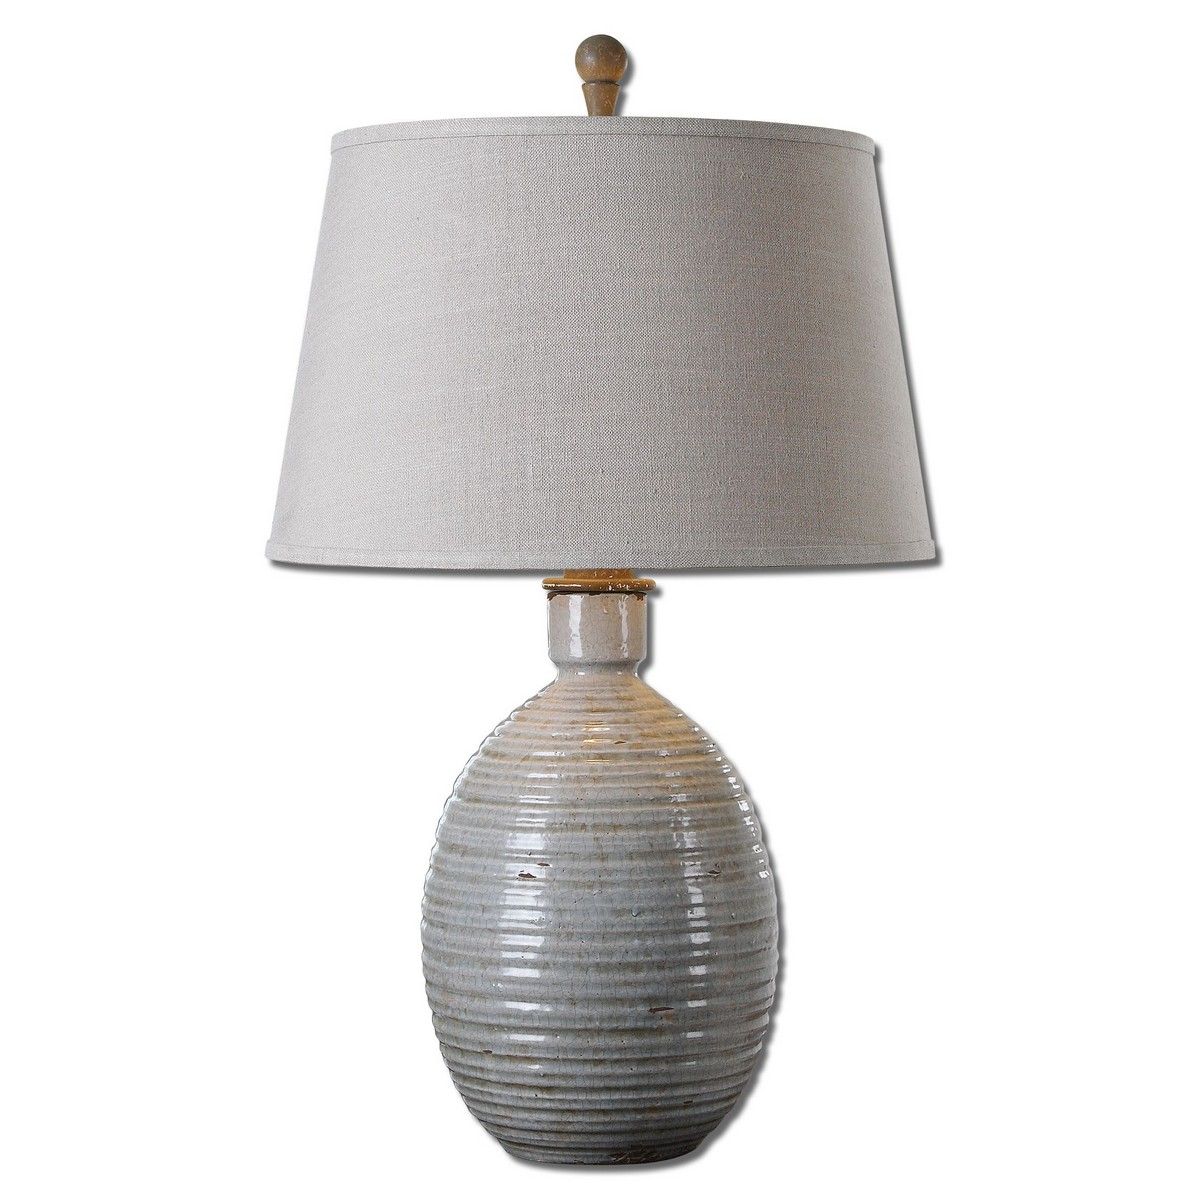 Uttermost Evigan Blue Ceramic Table Lamp Uttermost 26954 At